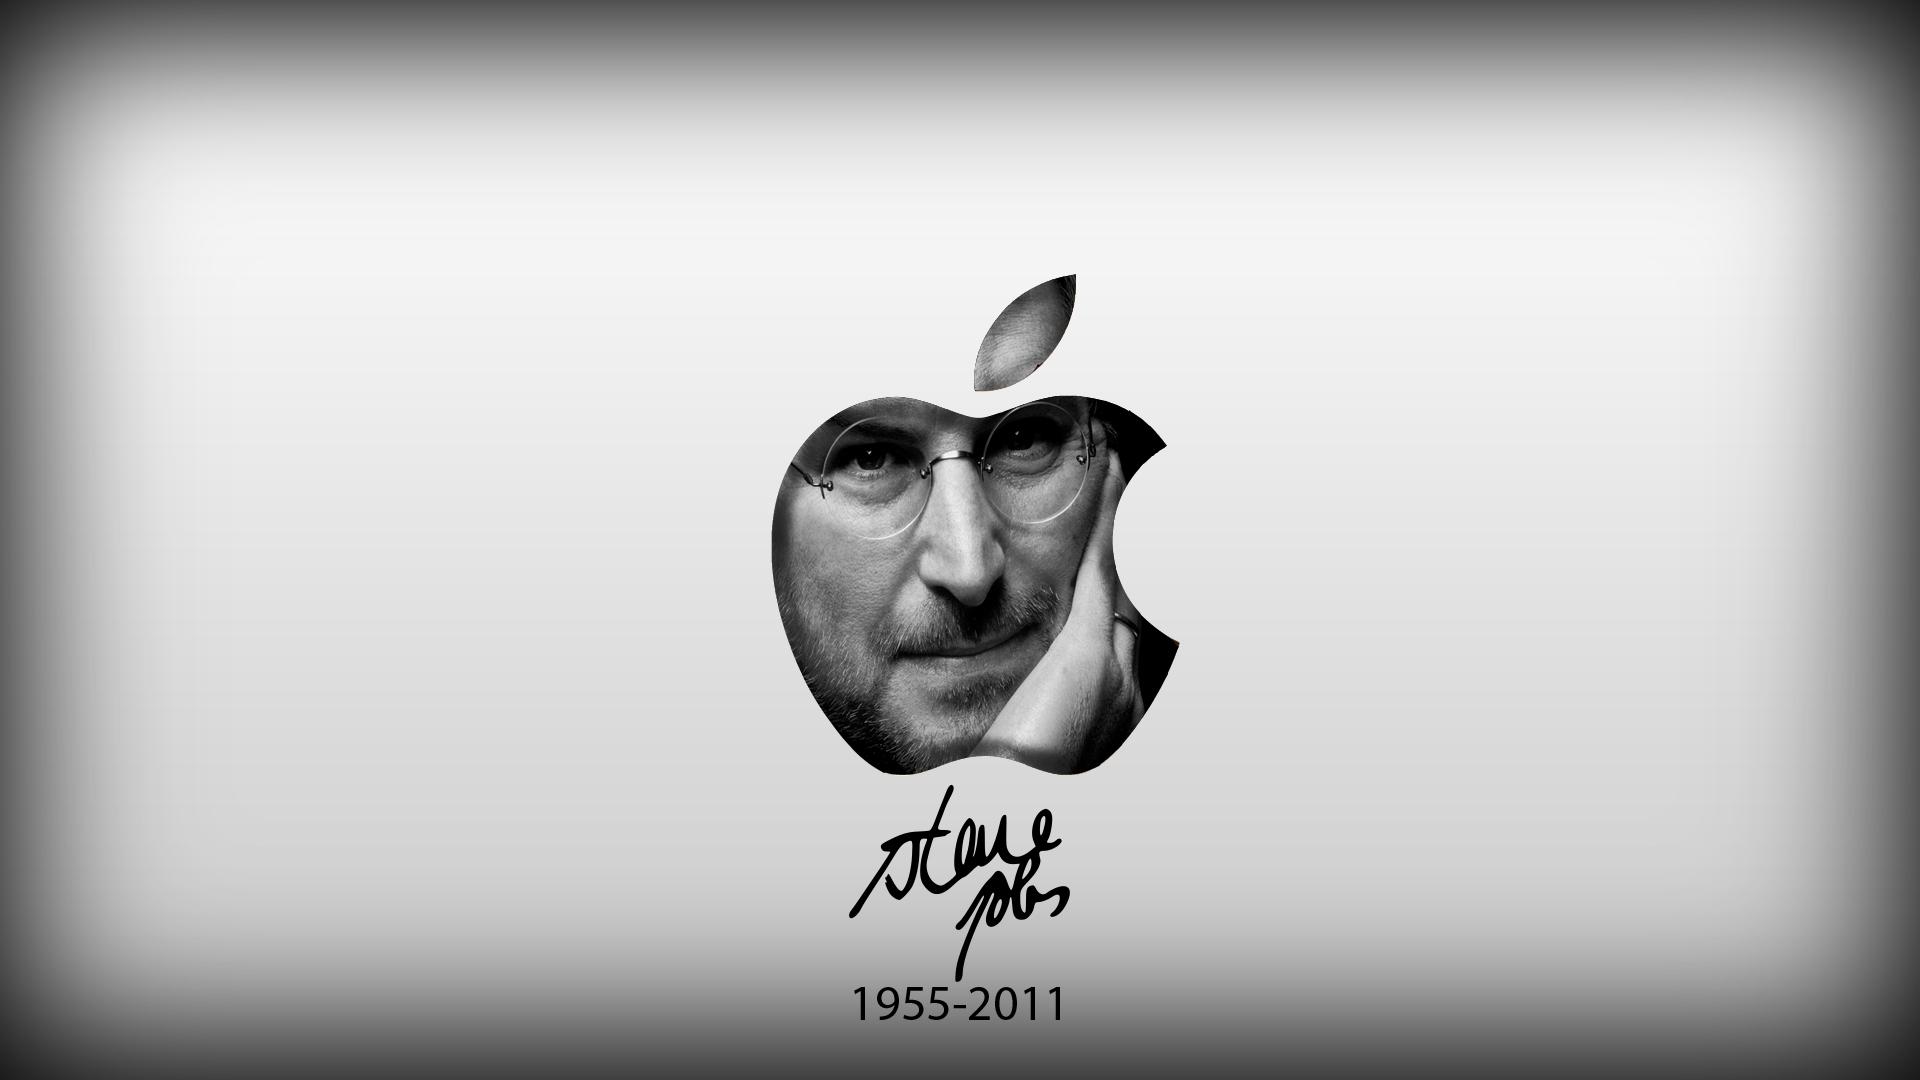 Steve Jobs Tribute Wallpaper Photo Image Portrait Men